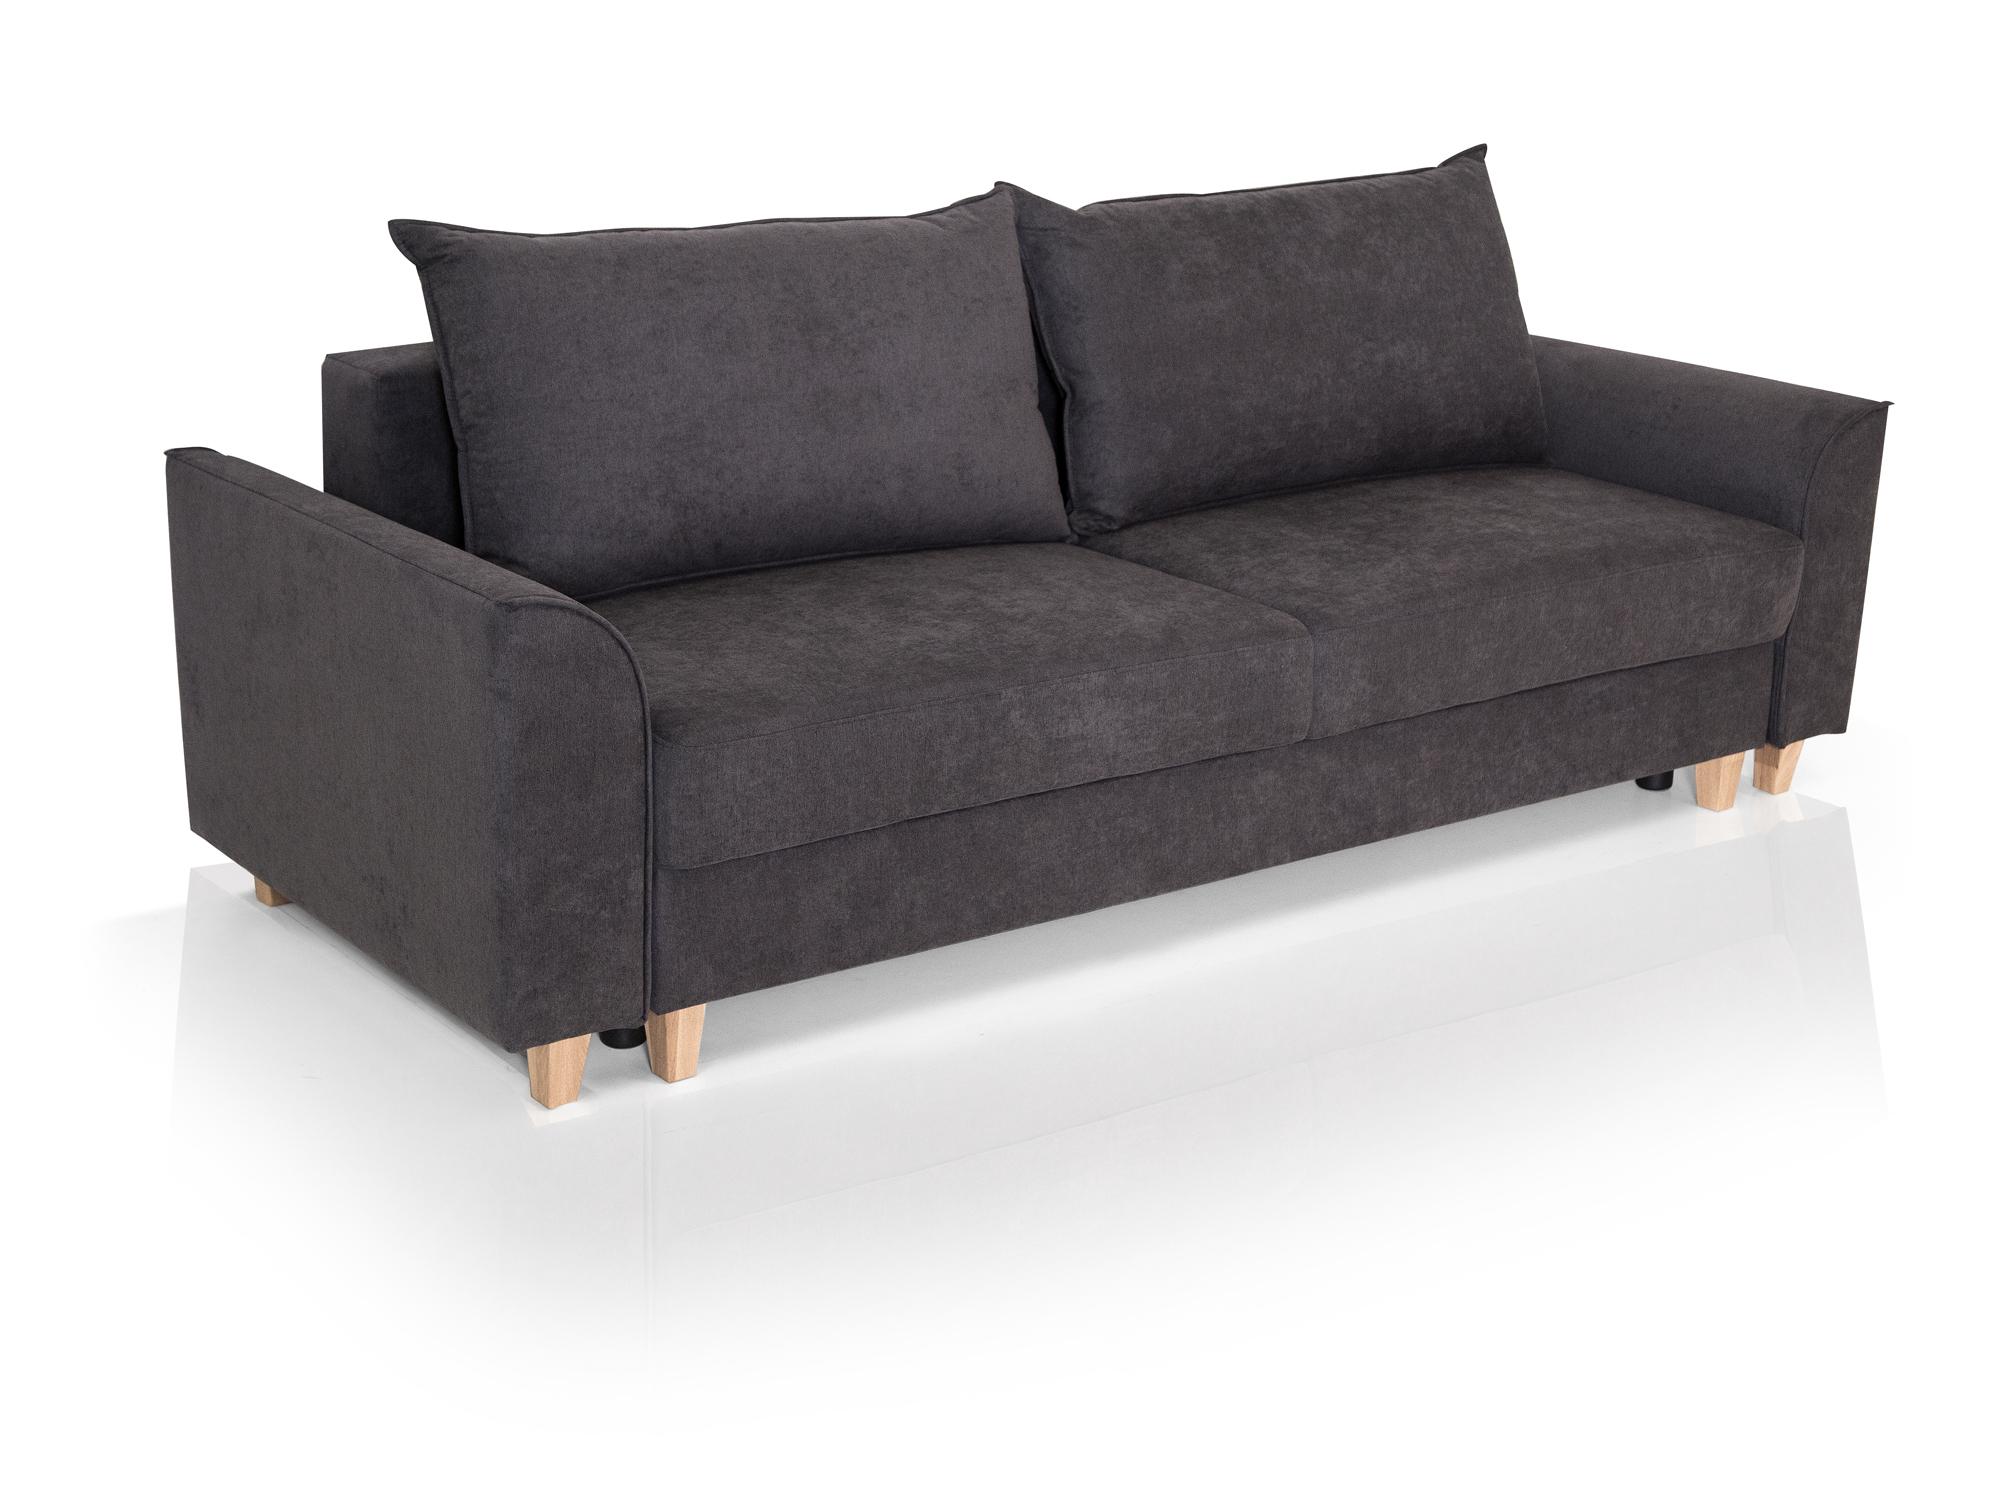 Jens sofa 3 sitzer anthrazit for Sofa york 3 sitzer